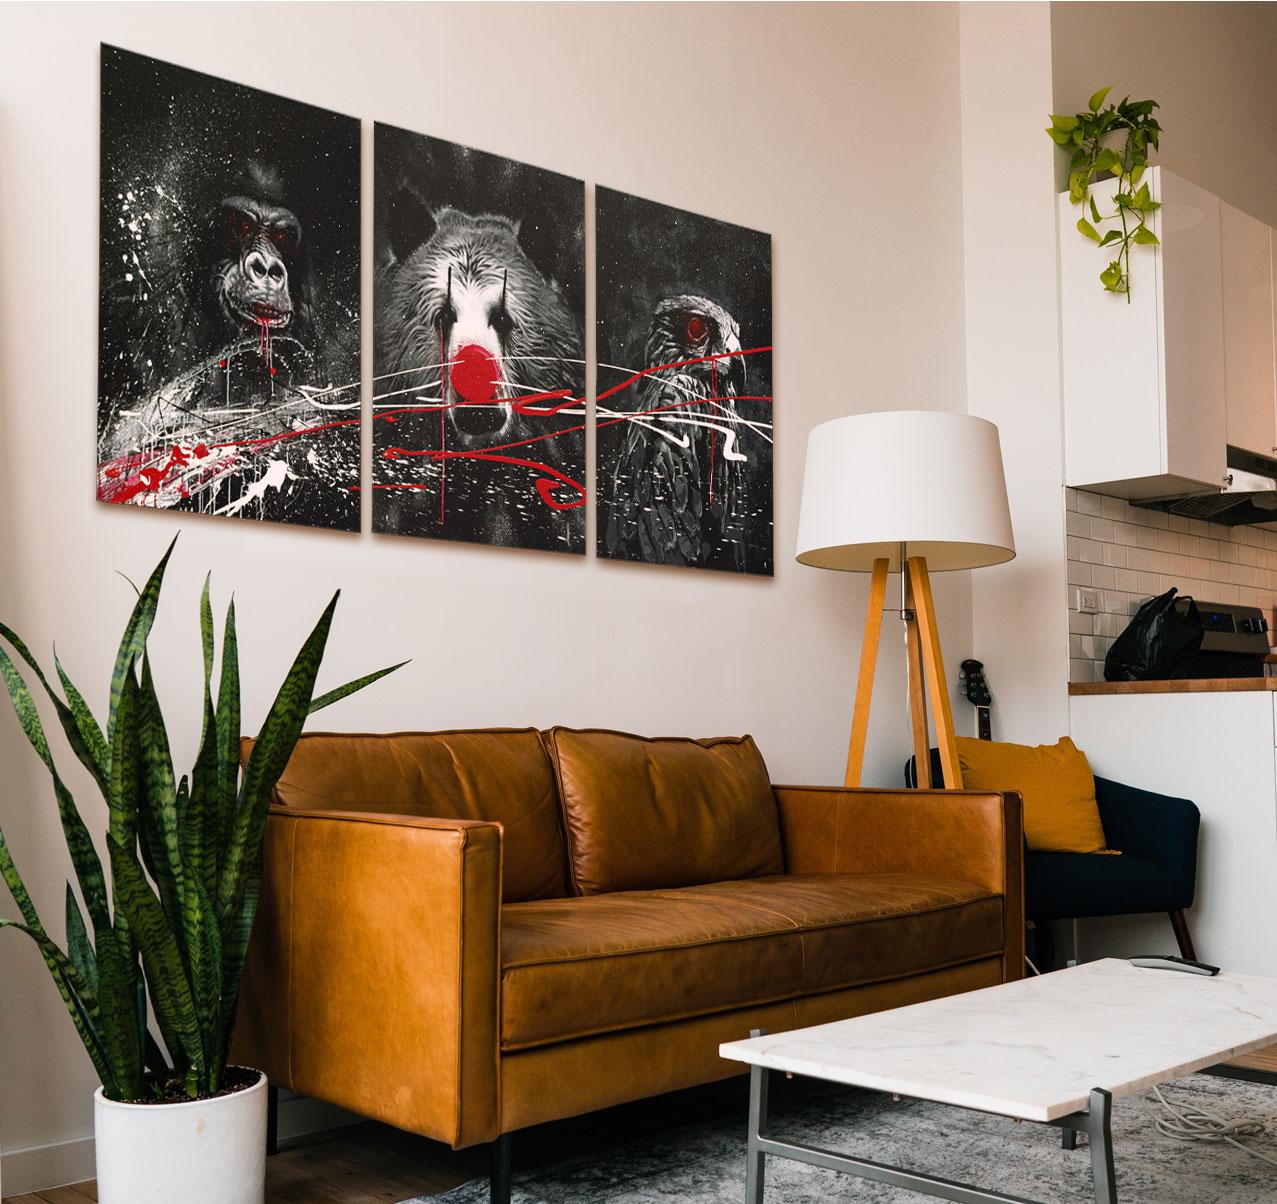 Triptyque Animaux, noir / blanc / rouge sang. Gorille, Ours, Milan 750€.